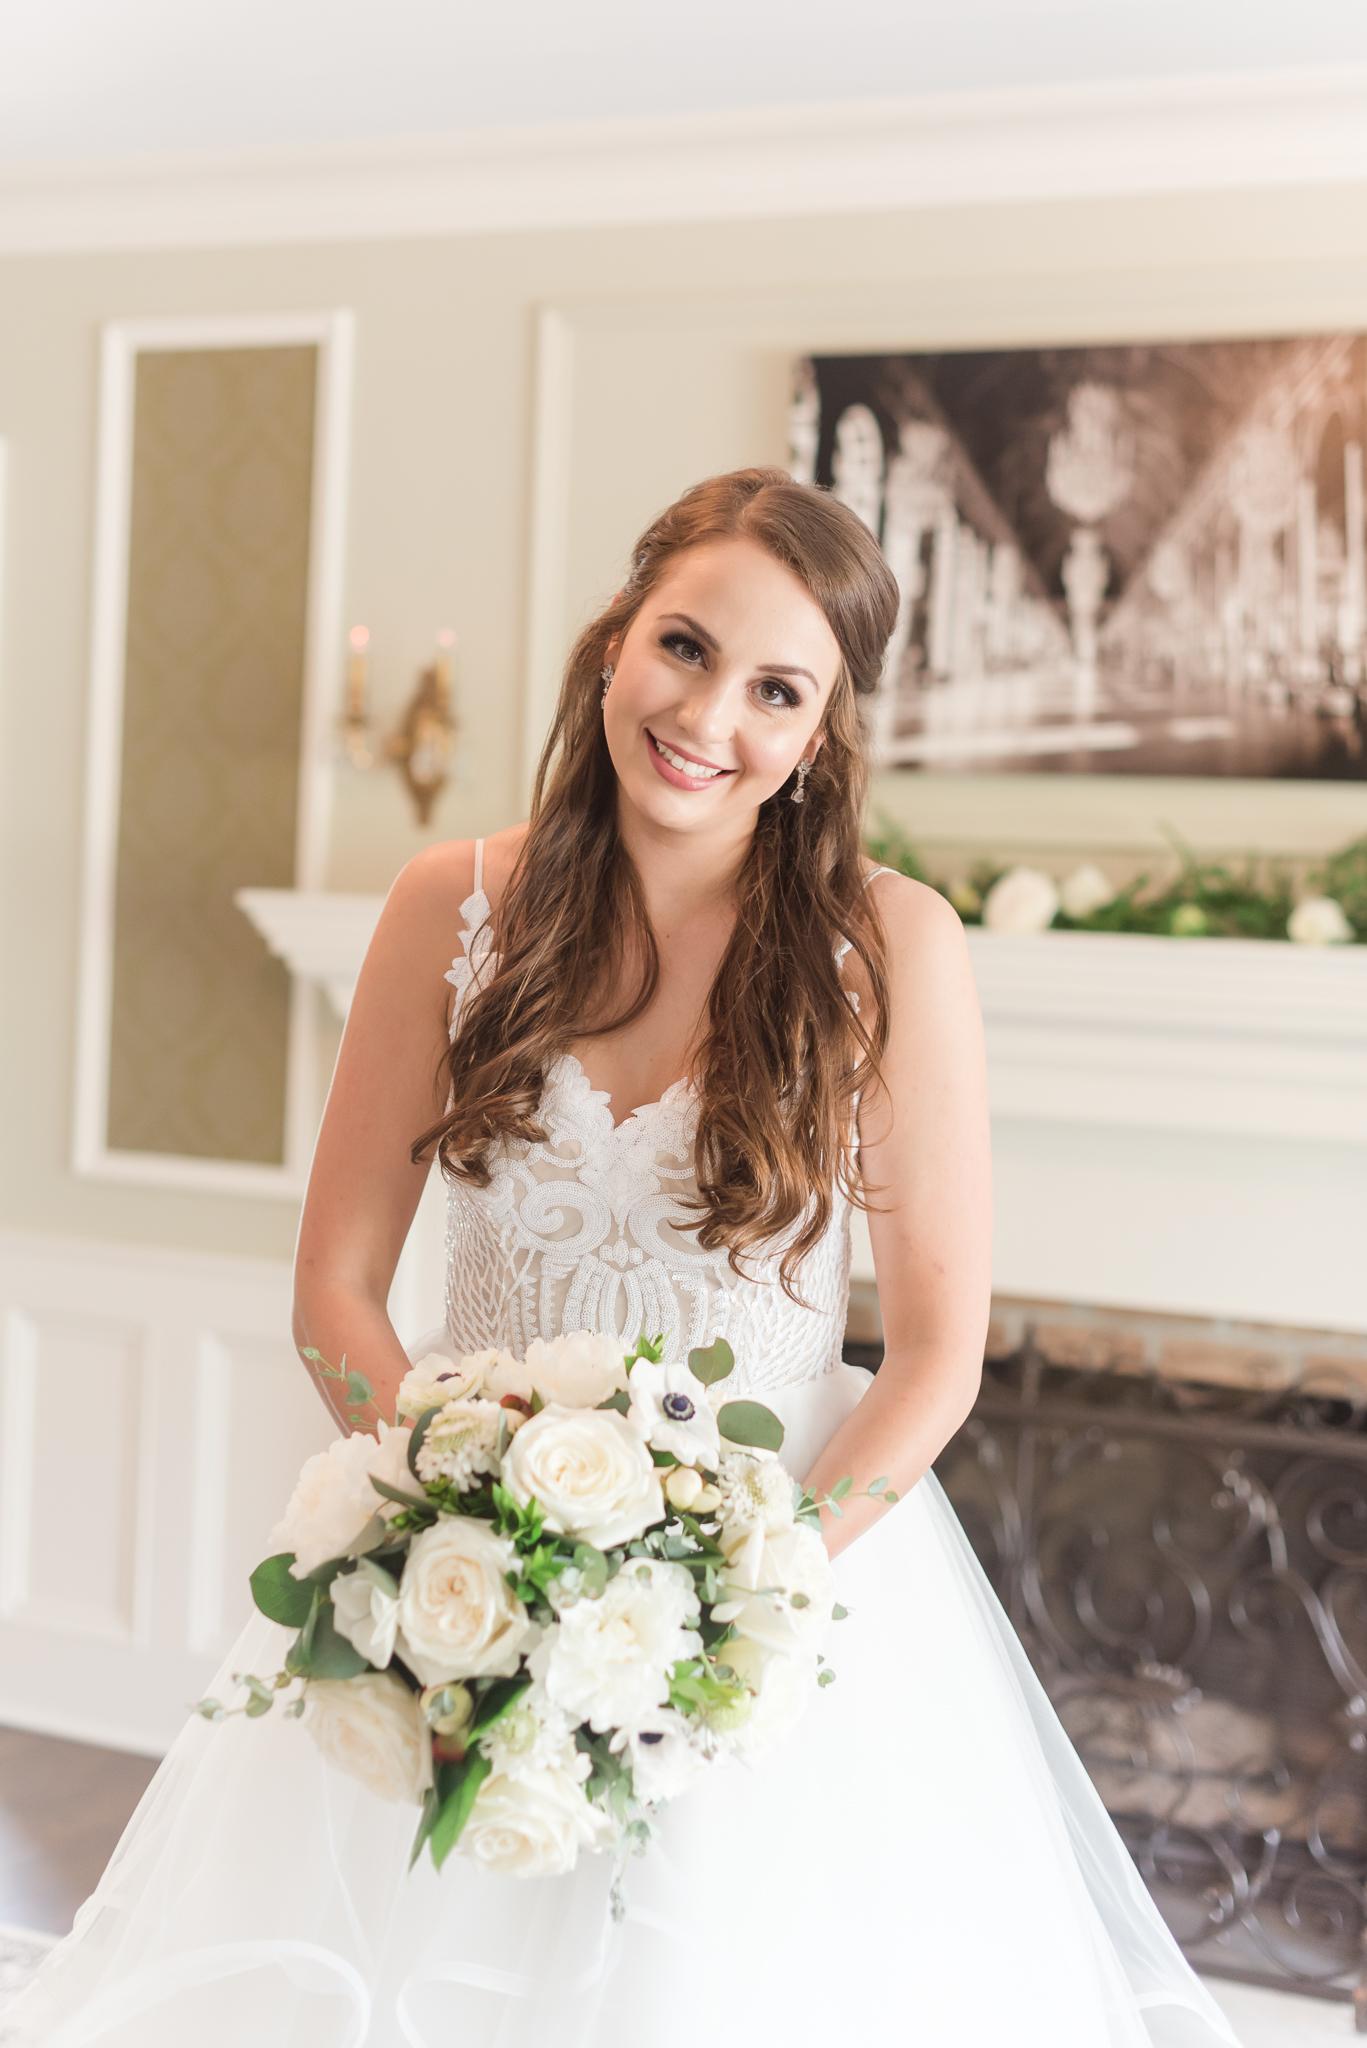 Black Iris Estate Wedding Elegant White with Greenery Luxury High End Flowers-5.jpg